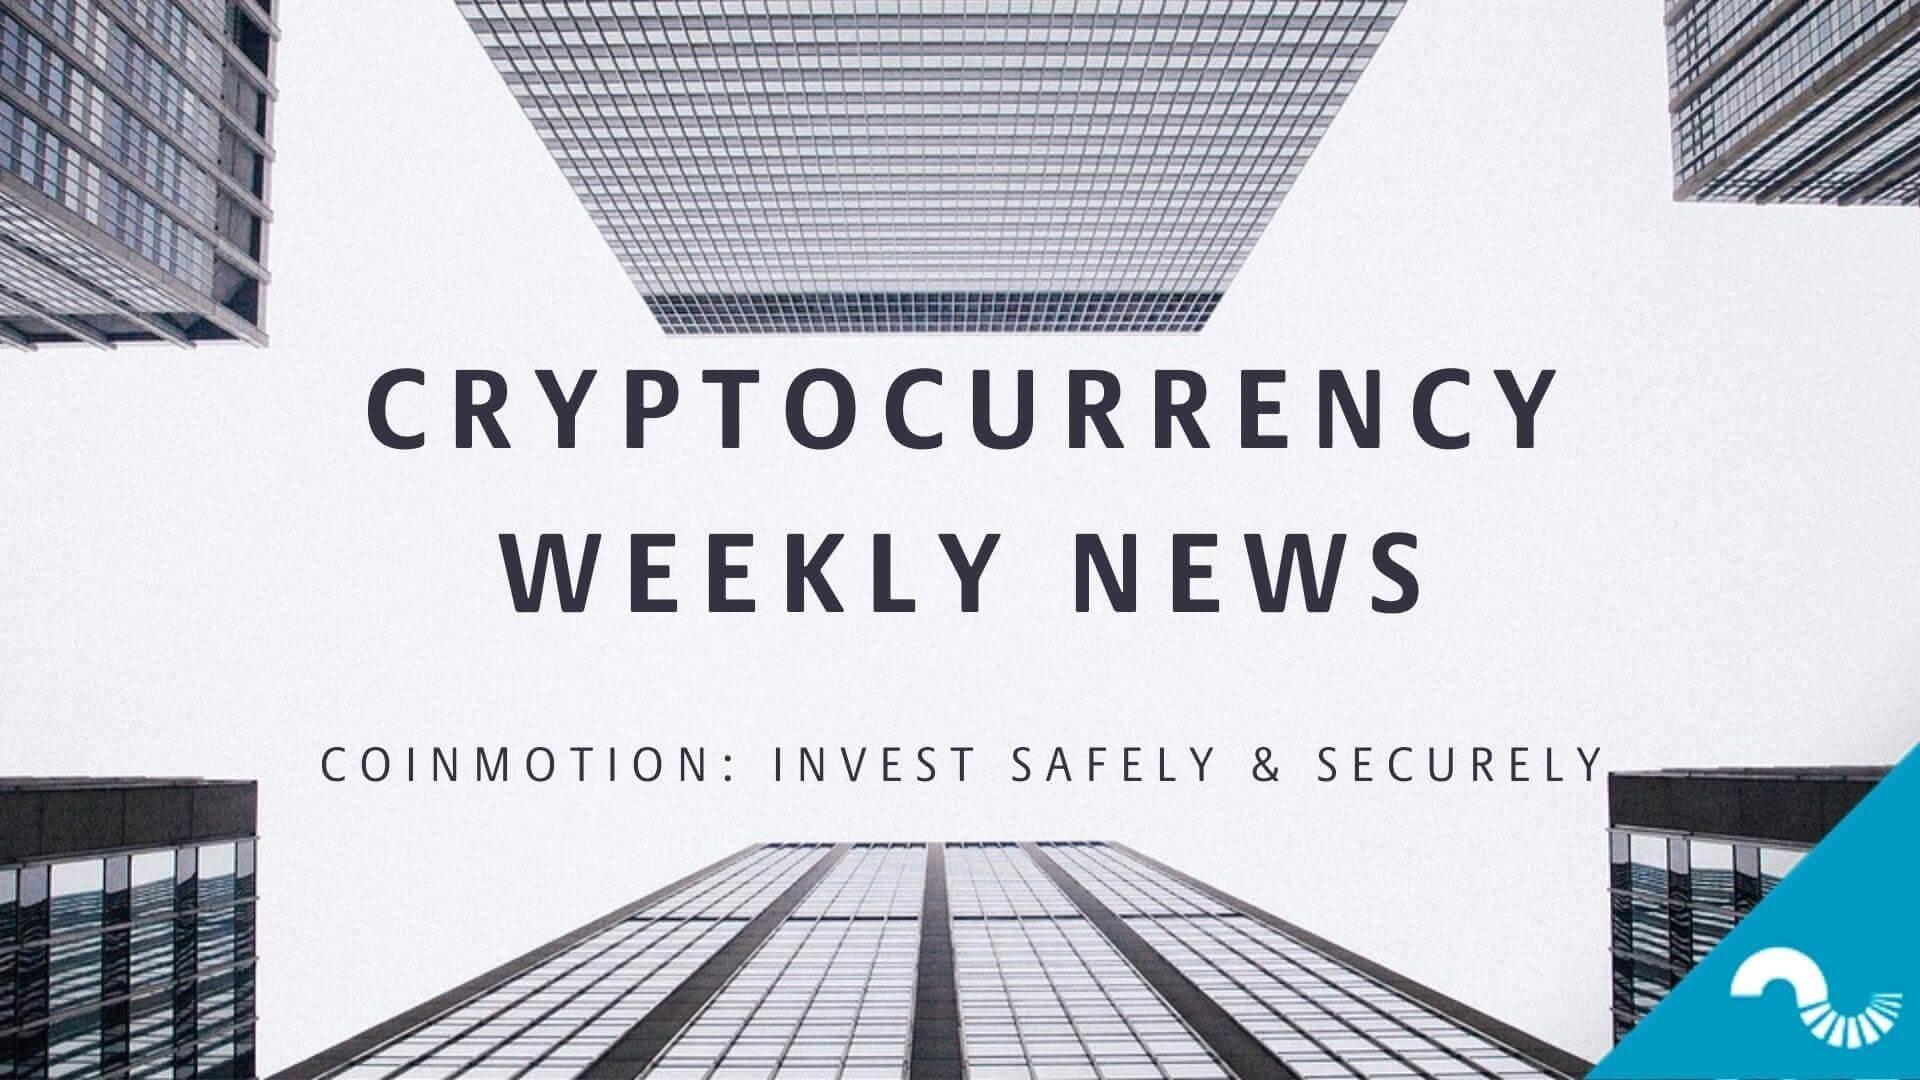 crypto weekly news coinmotion